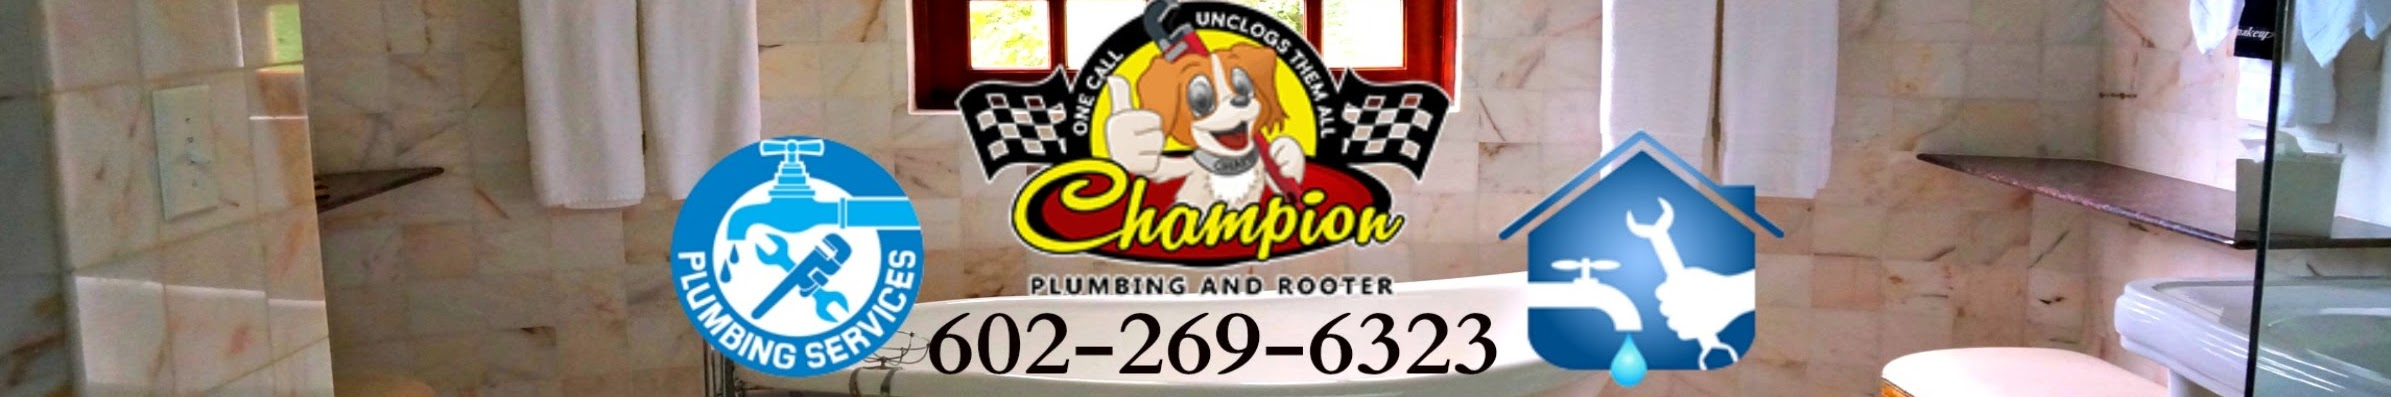 Champion Plumbing Rooter You